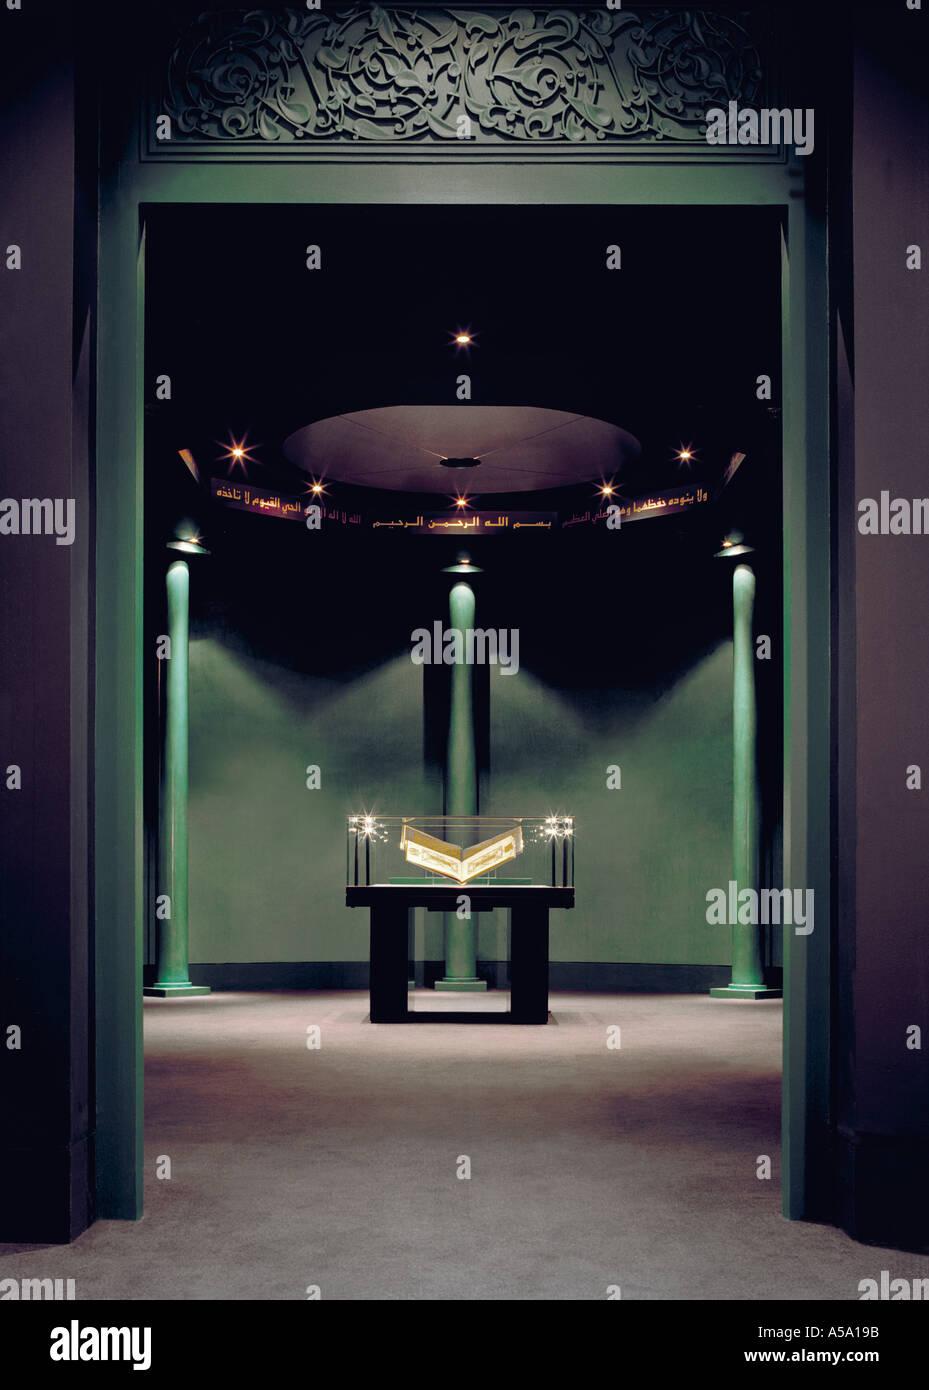 Koran display at the Chester Beatty Library Dublin Castle Dublin Ireland - Stock Image